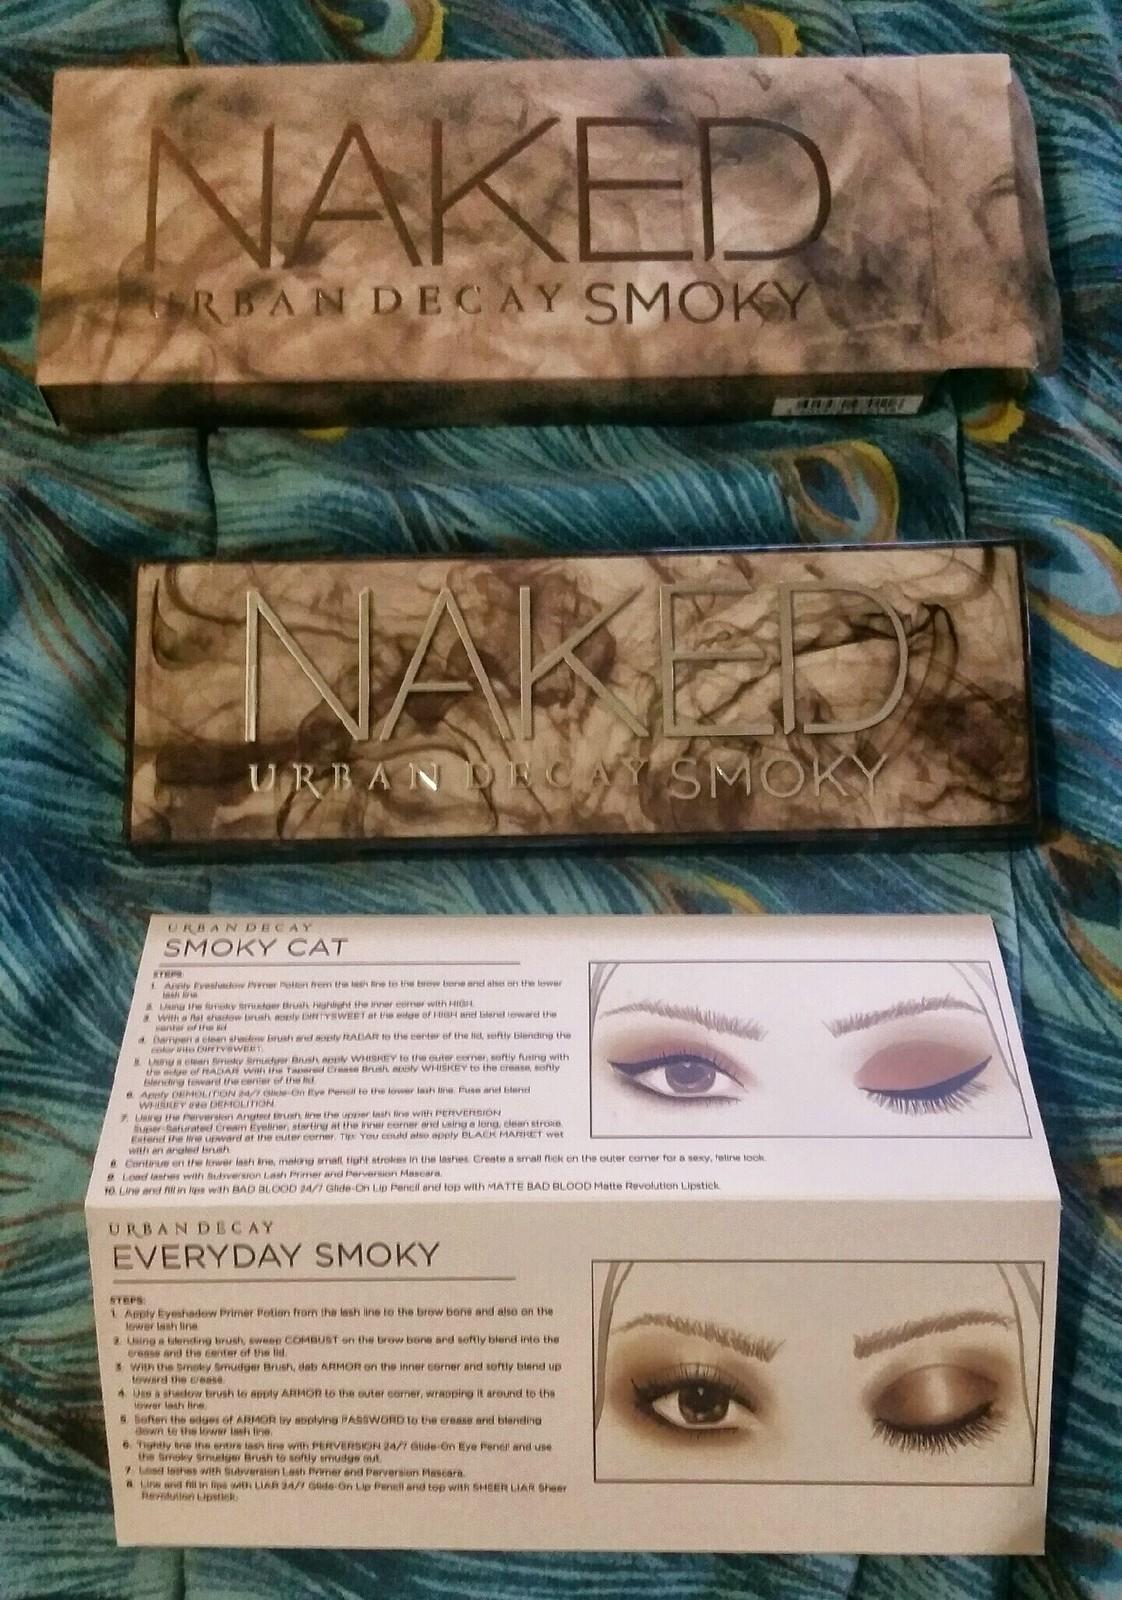 """NAKED"" URBAN DECAY SMOKY Eye Shadow  - $43.50"